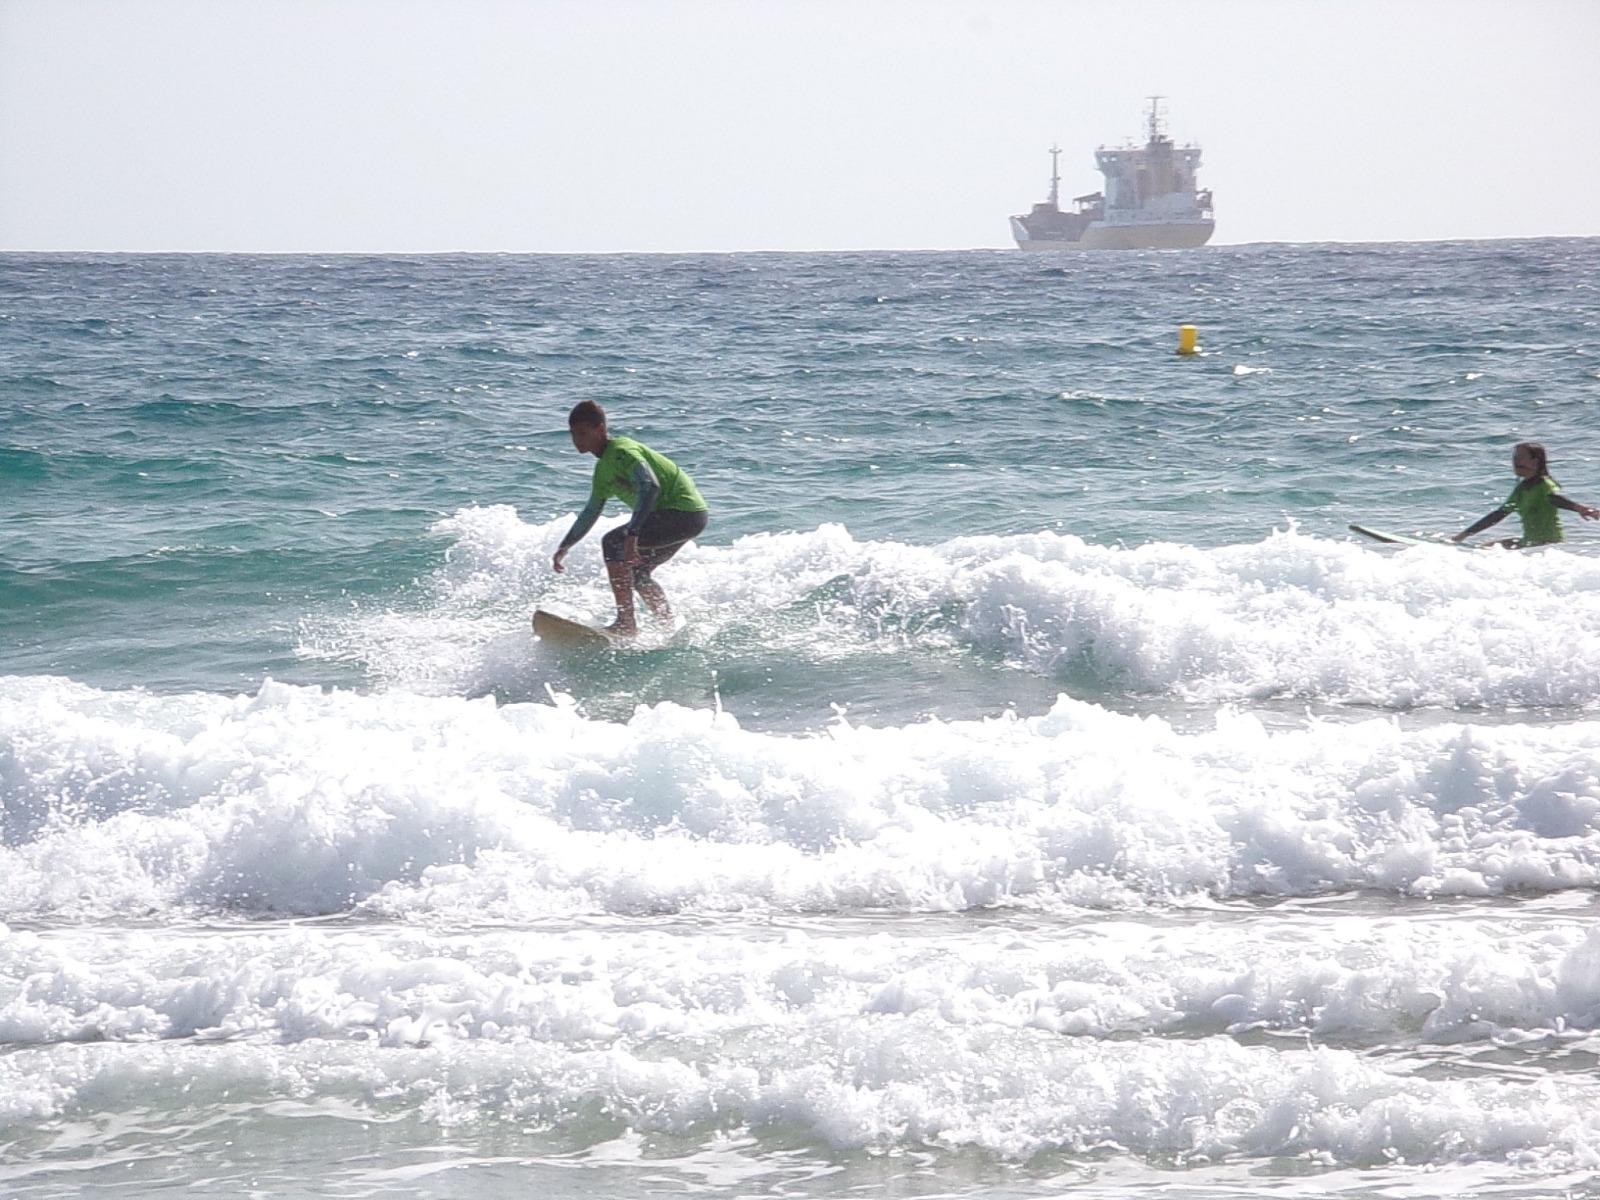 VERANO 2019 FUERTE TRIBU SURFWhatsApp Image 2019-07-28 at 23.21.39.jpg